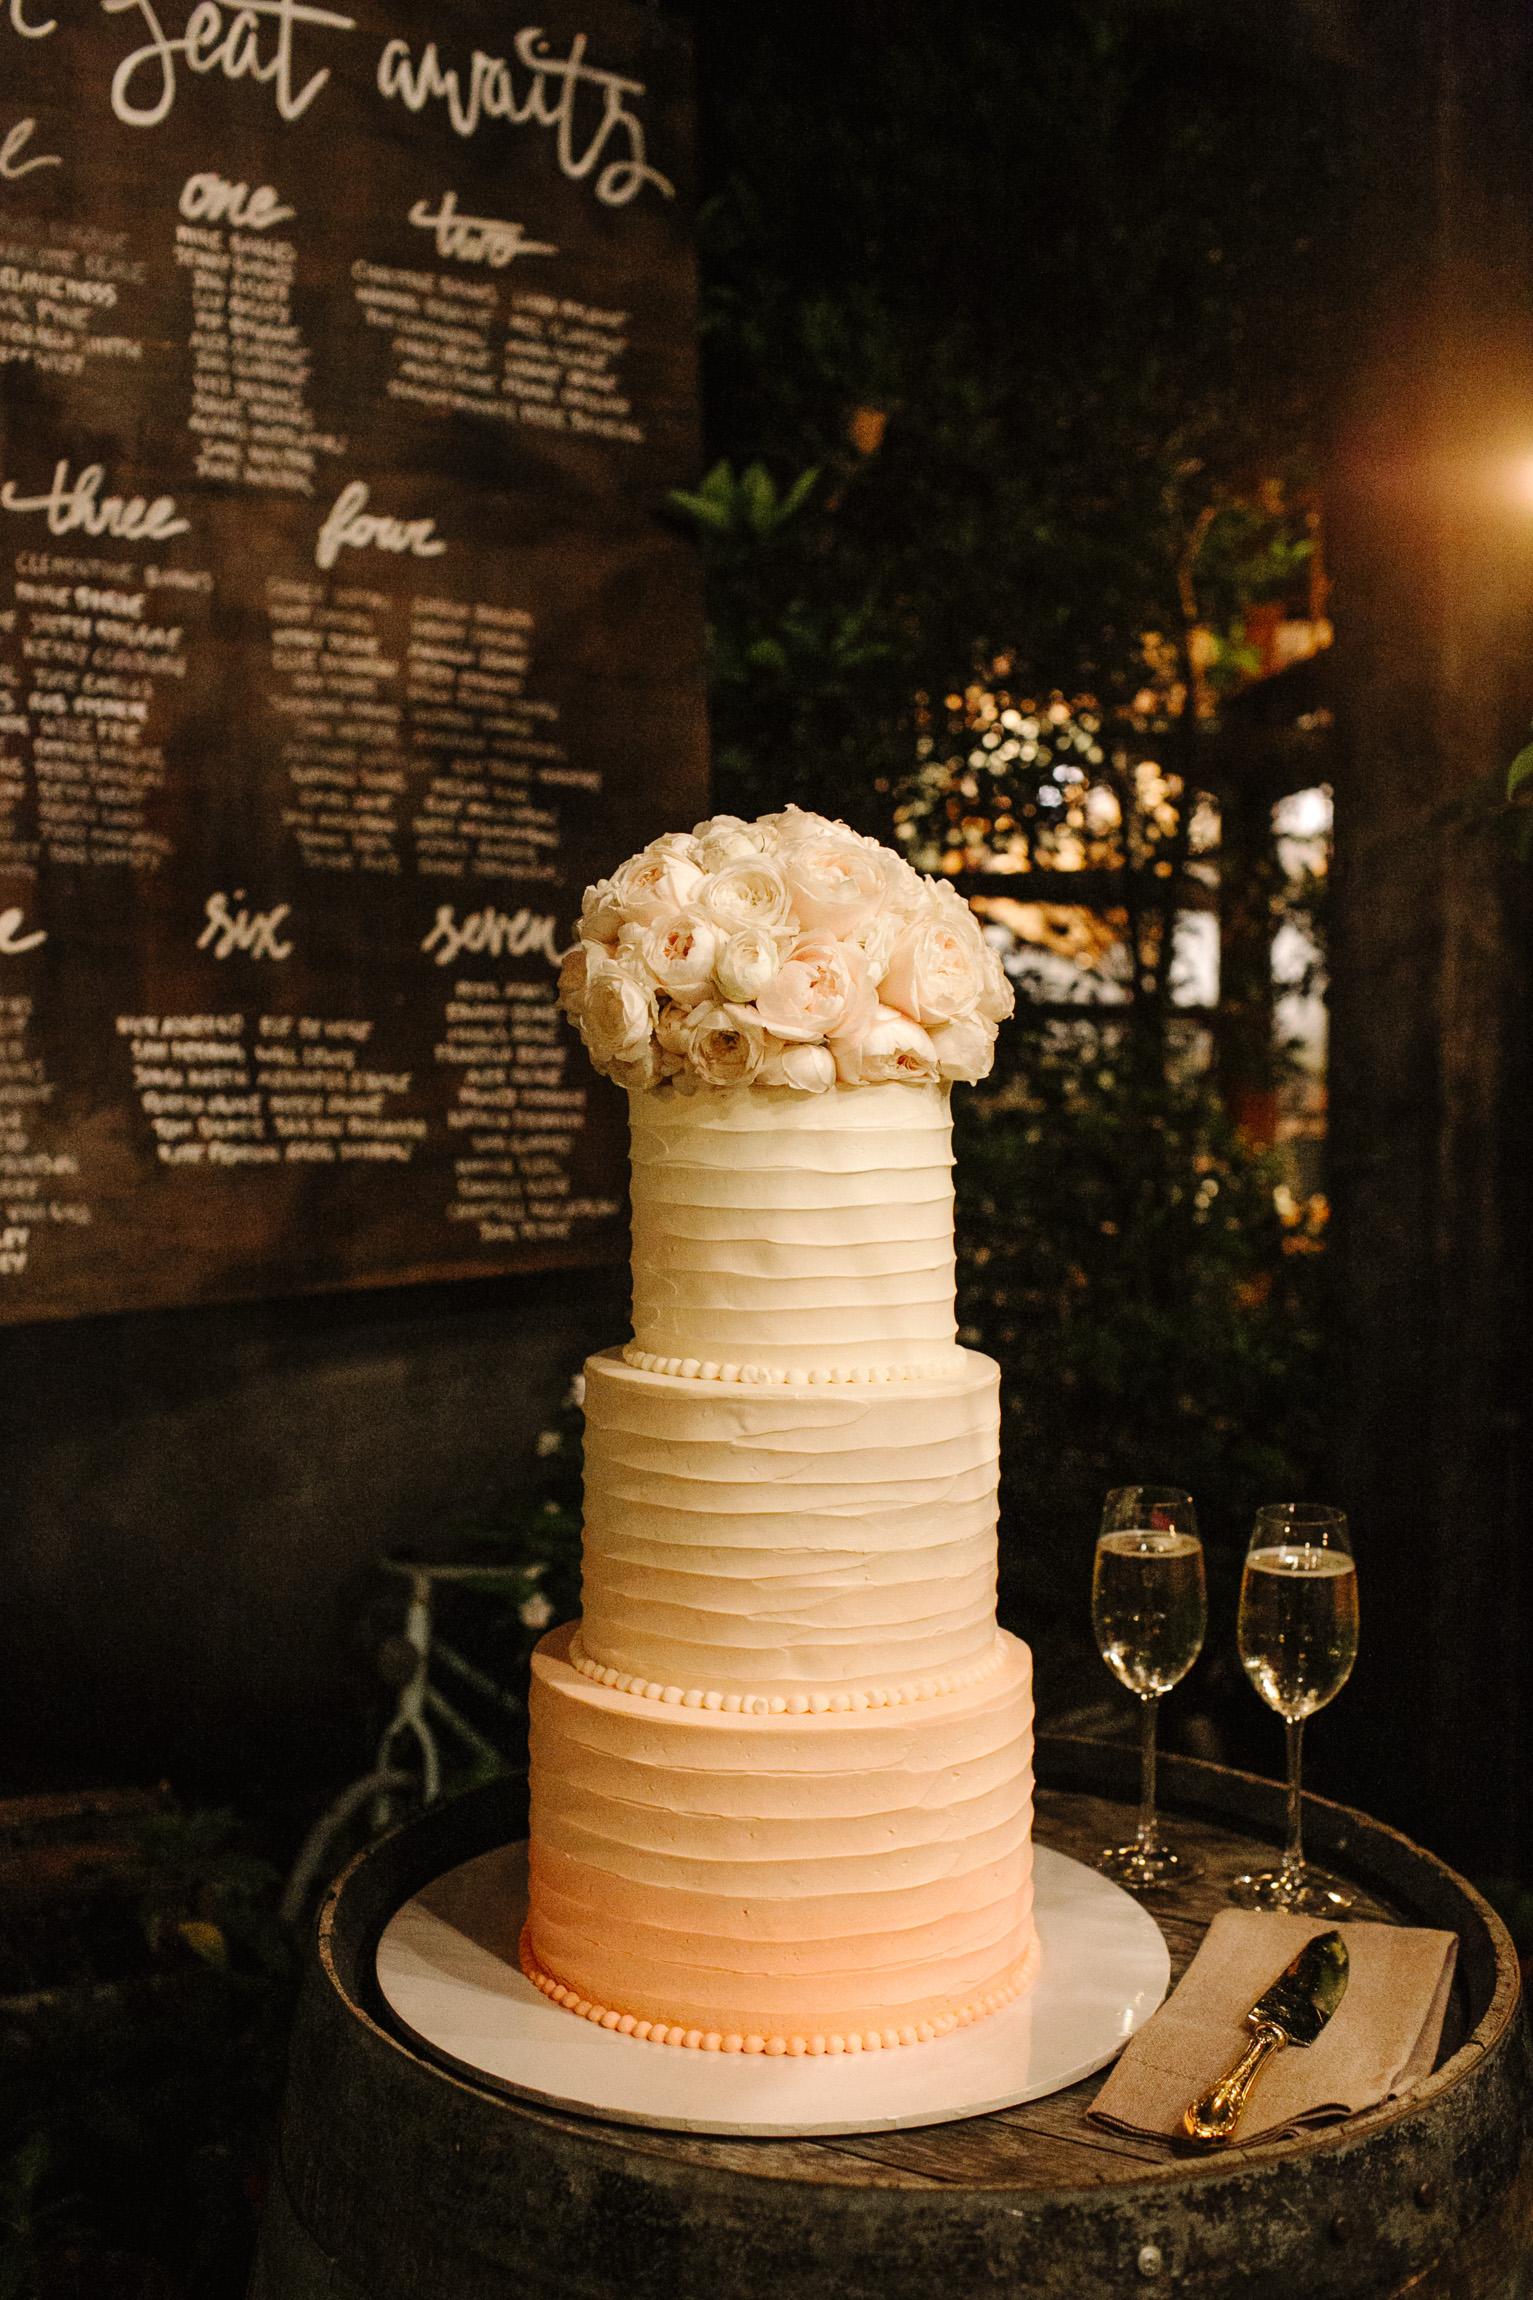 180223_justinaaron_wedding_charlotte_david_h-279.jpg